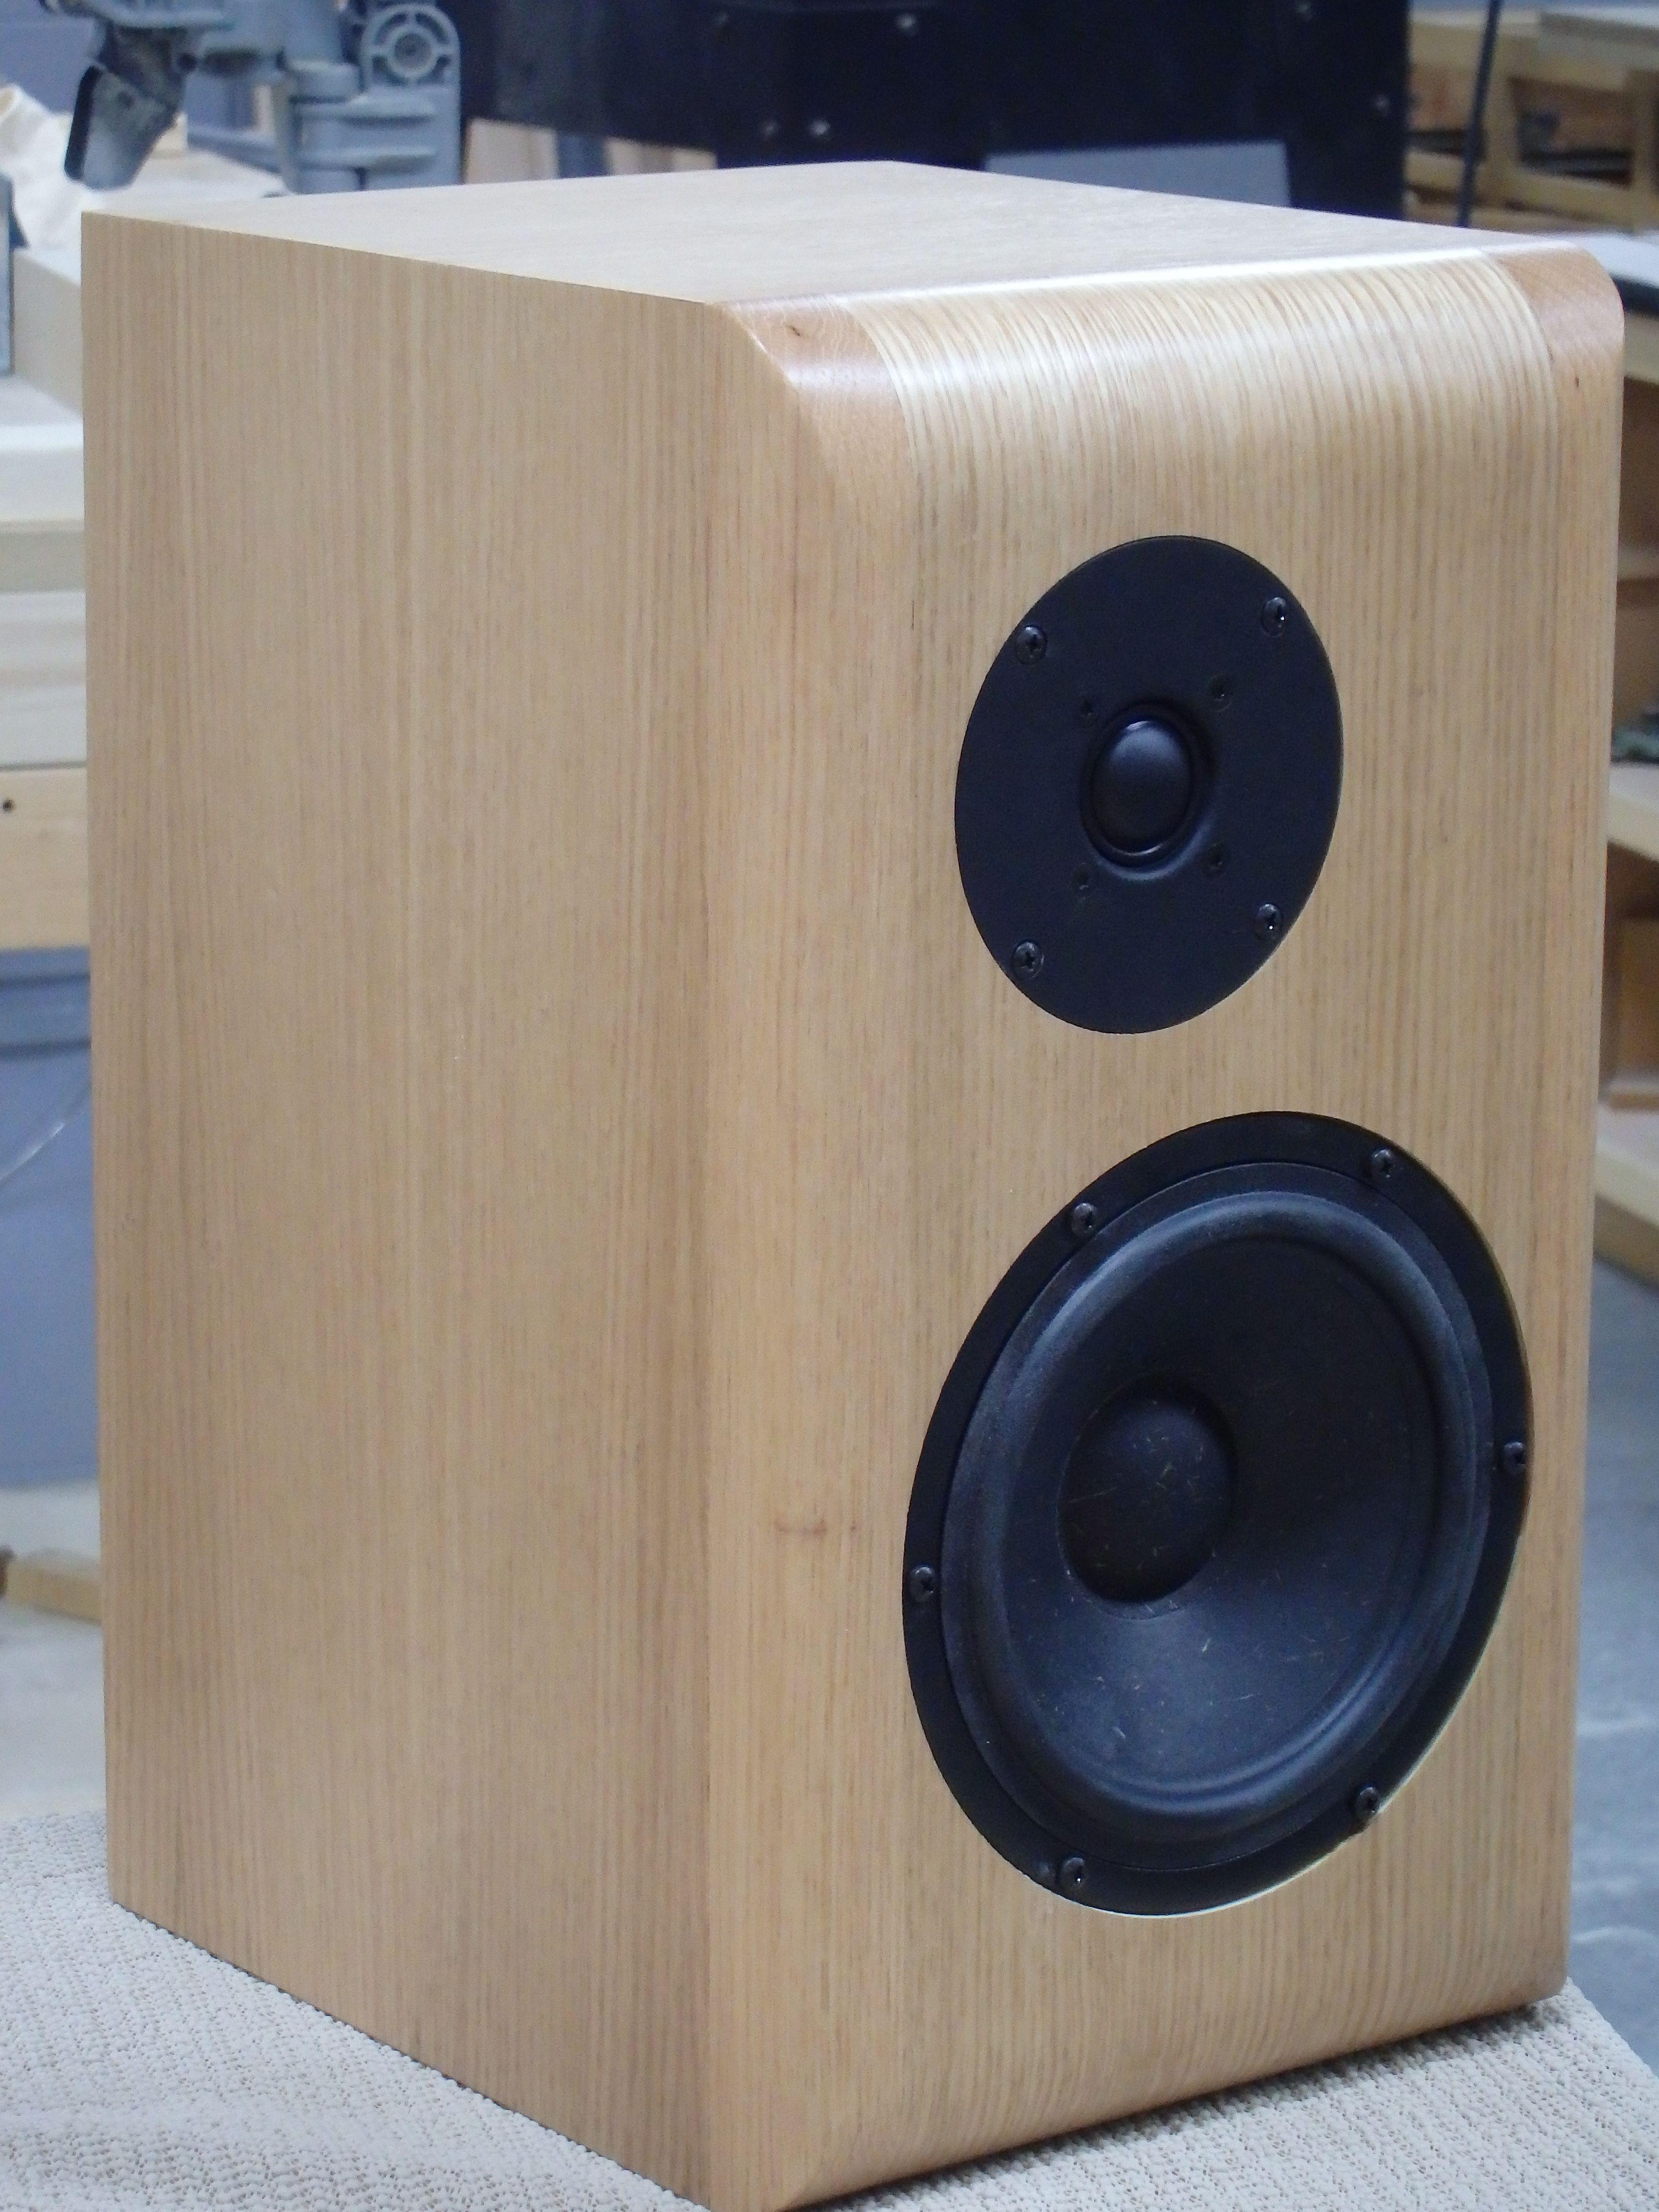 sr71 diy speaker kit